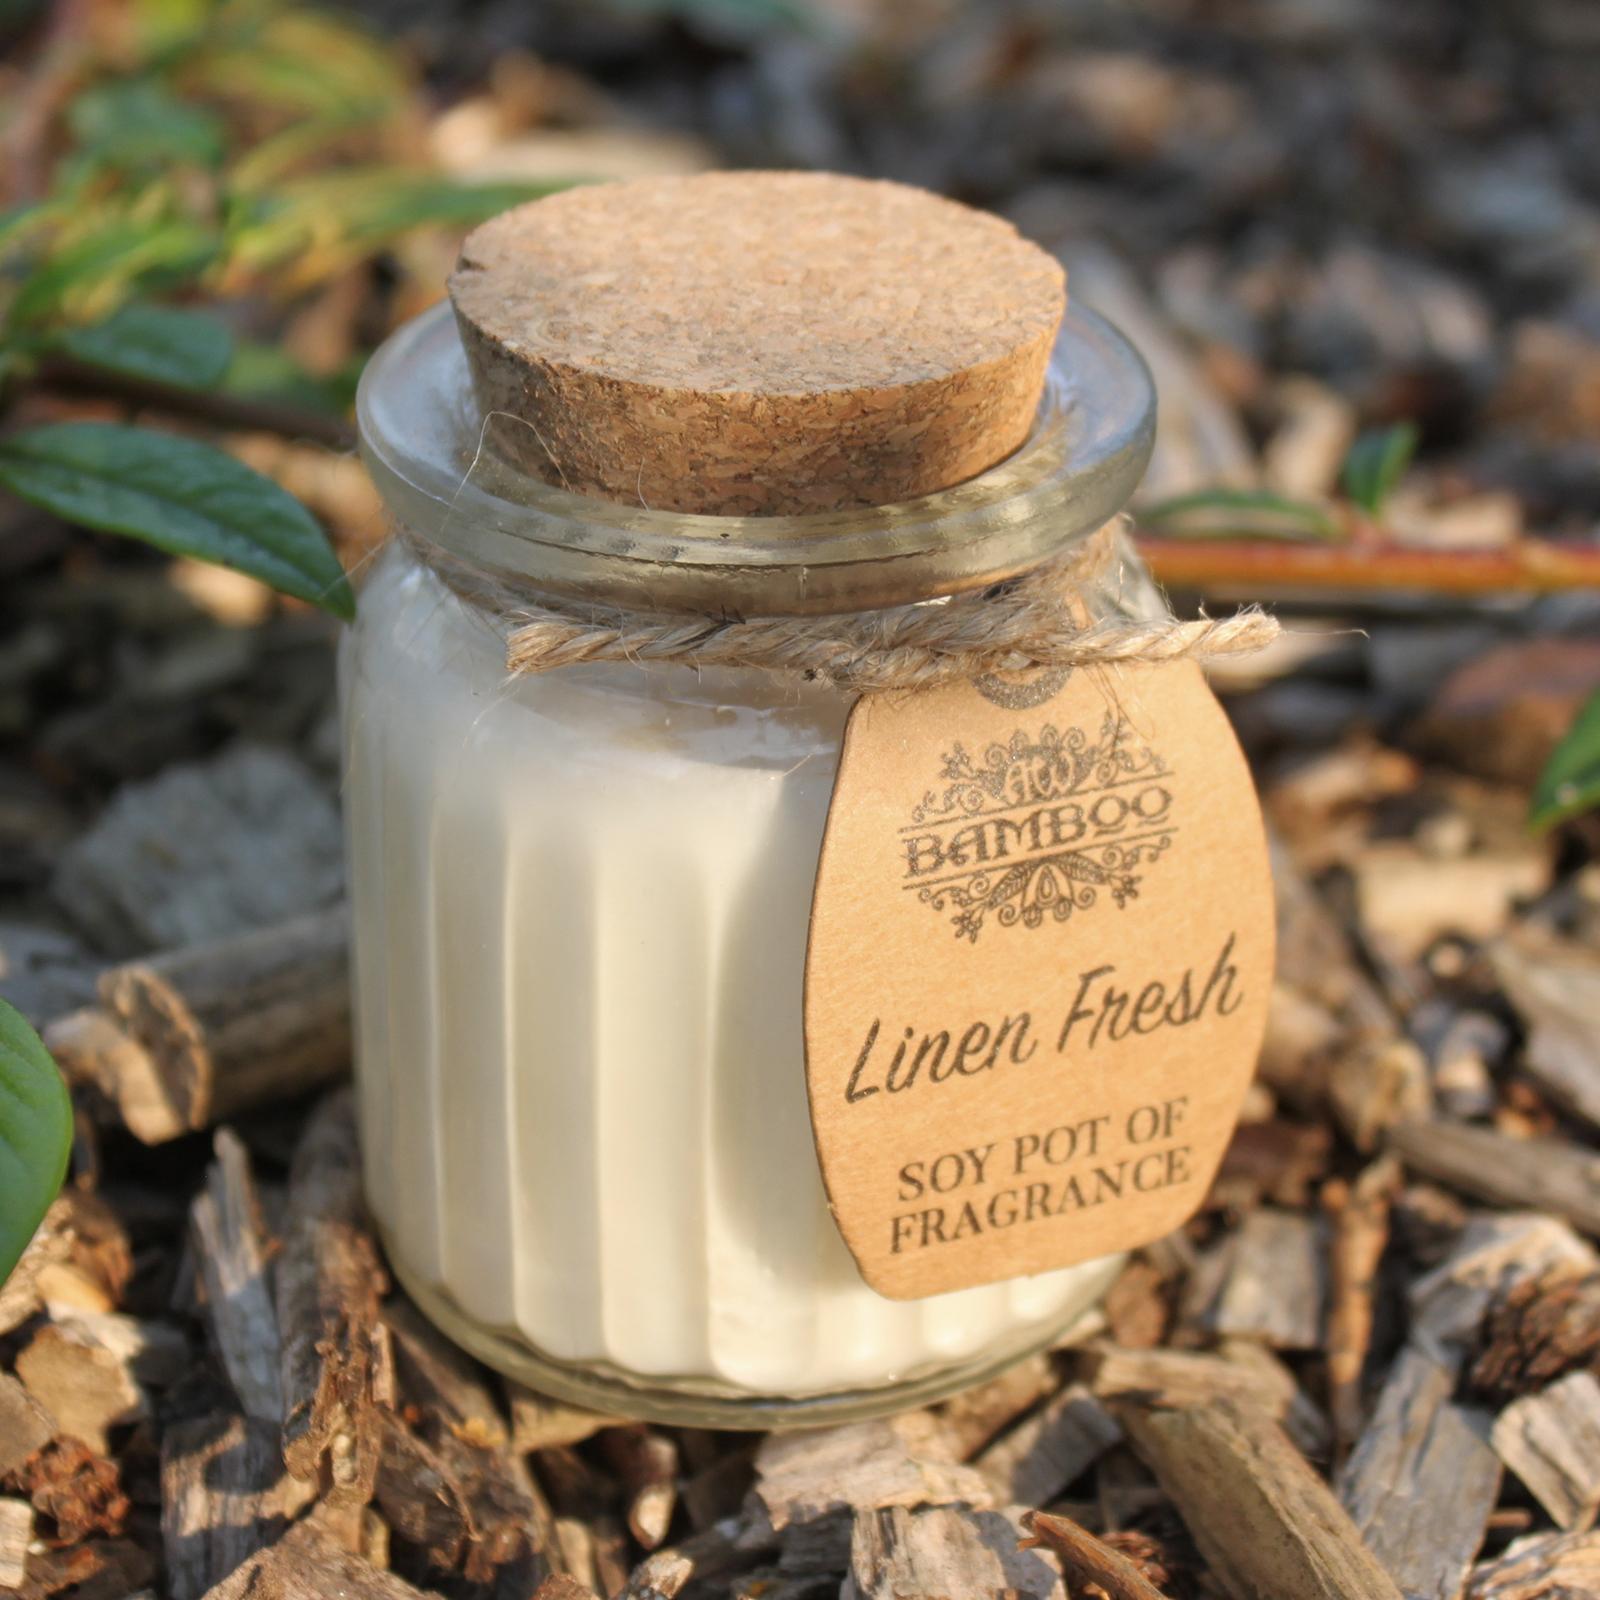 2x Linen Fresh Soy Pot of Fragrance Candles